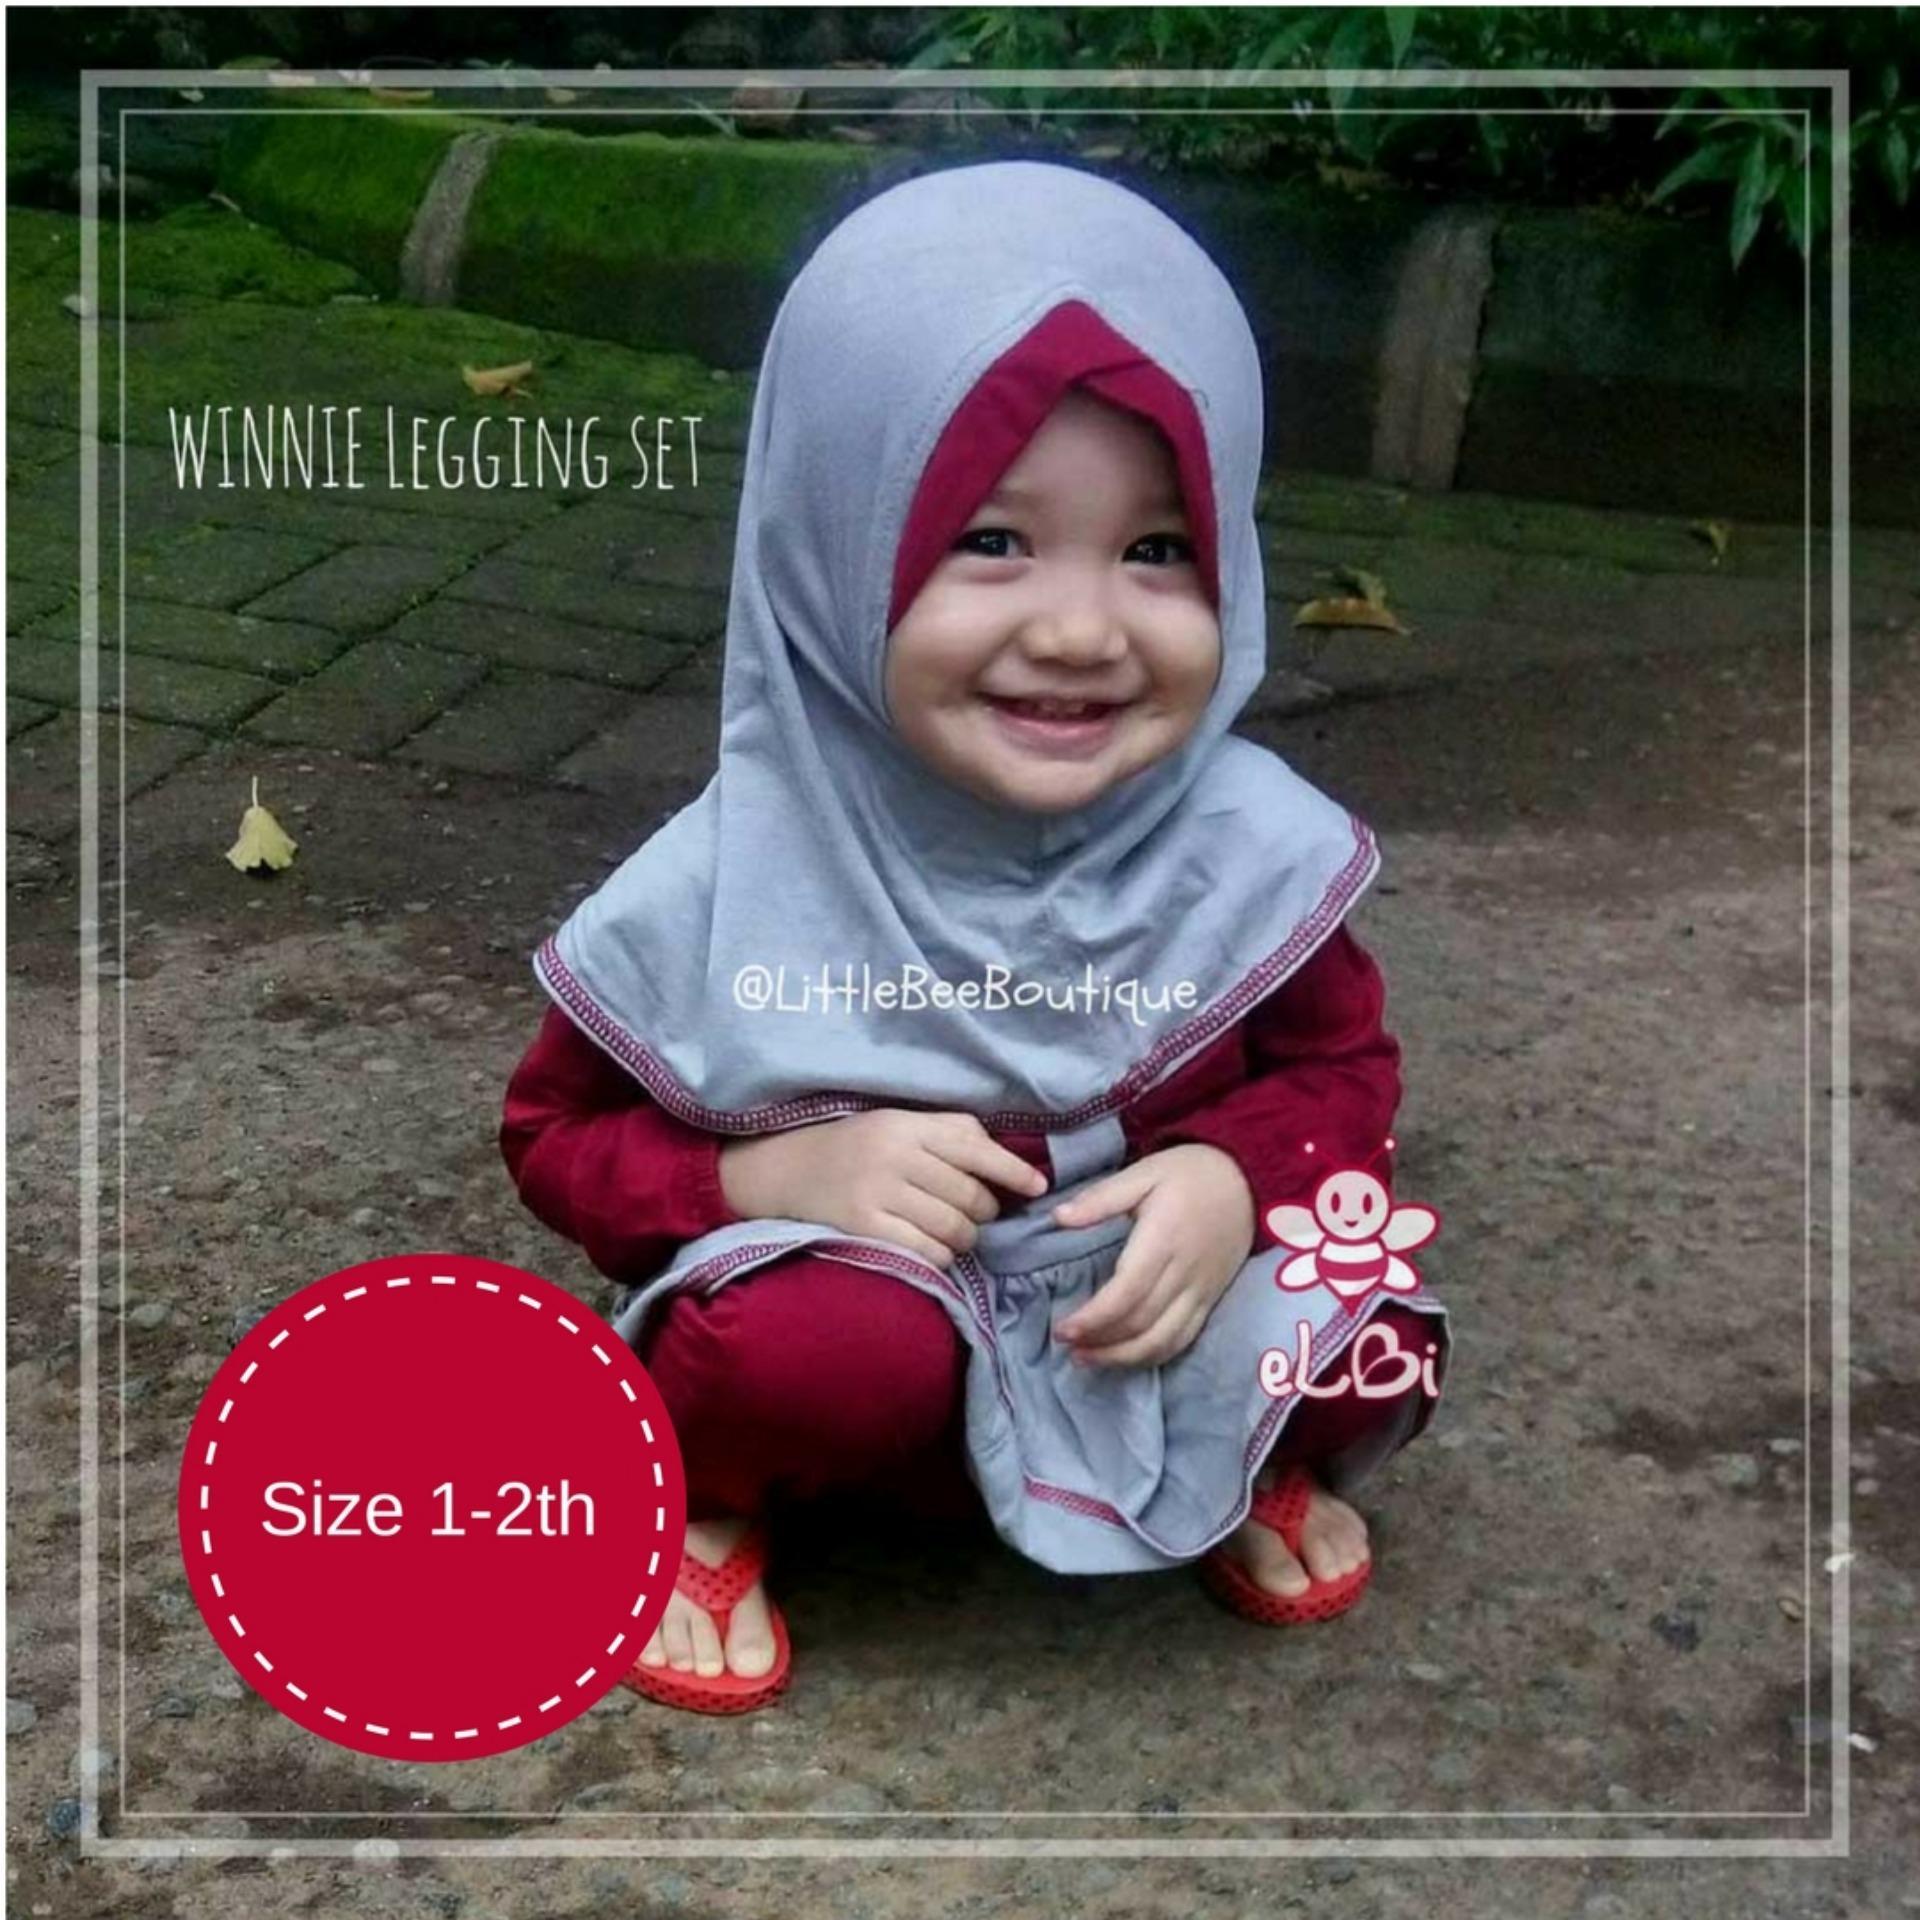 eLBi Winnie Legging Set Baju Muslim Anak Balita Pakaian Muslimah Bayi Baju Bayi